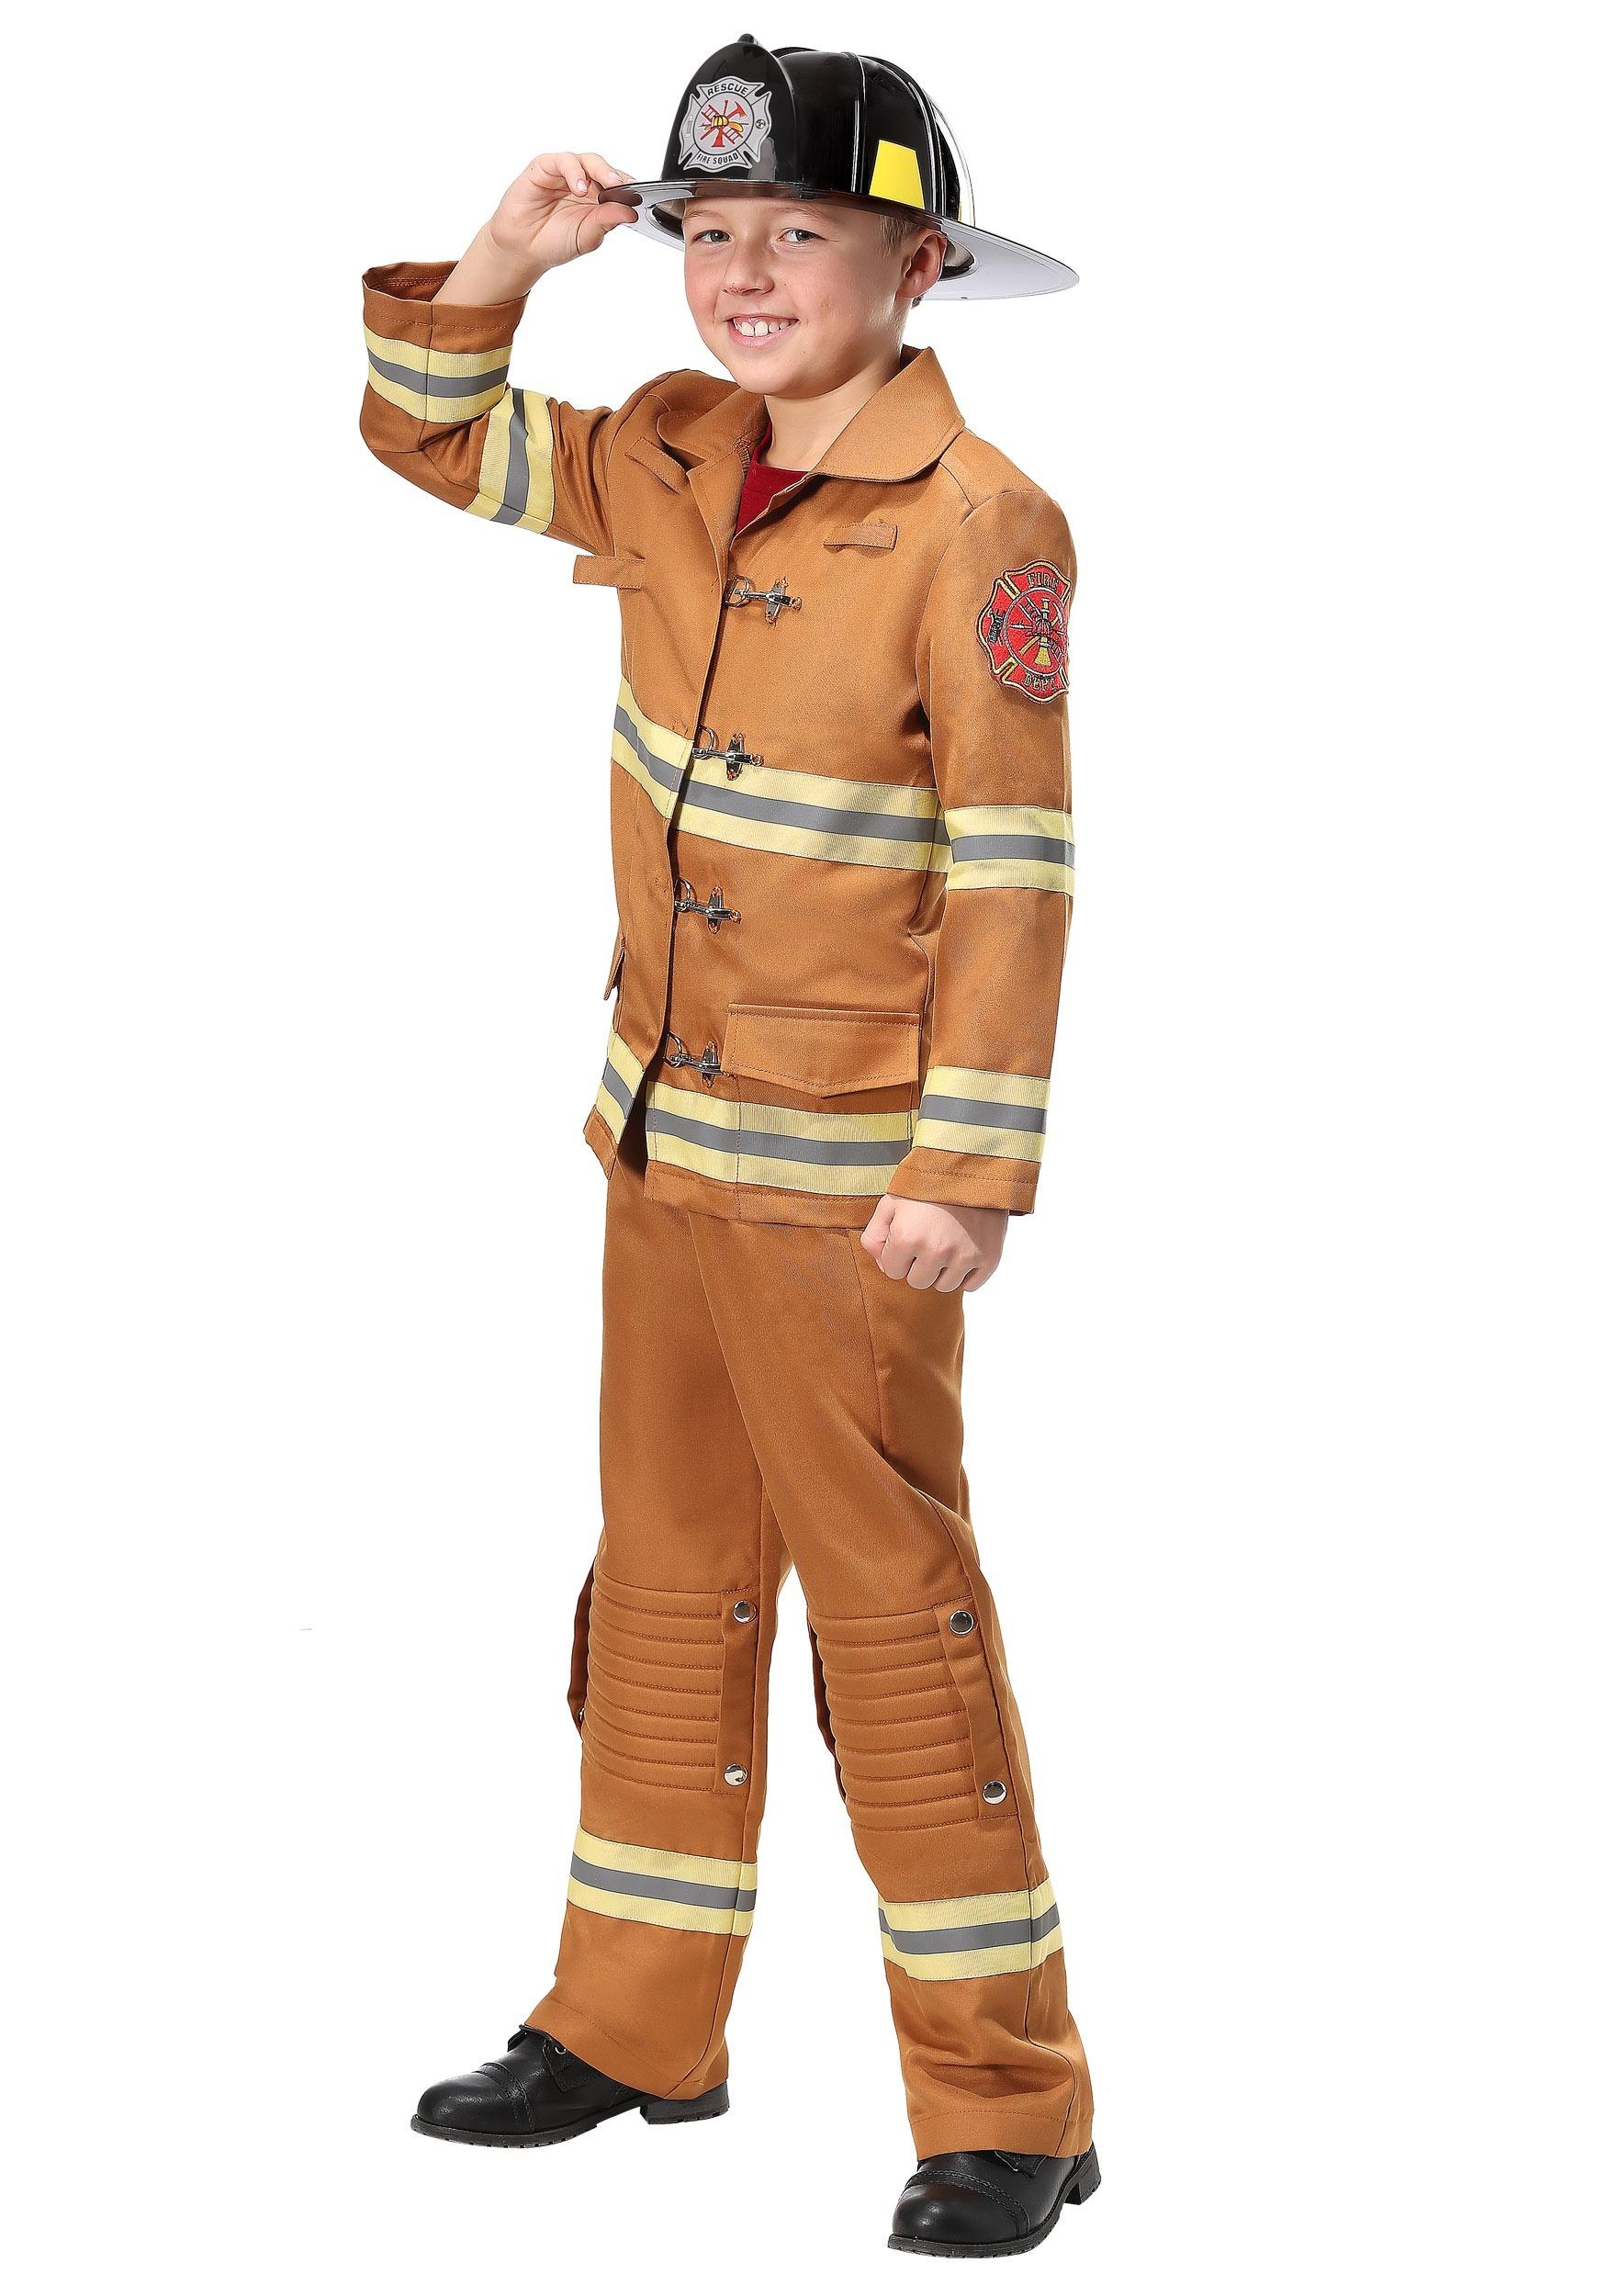 Firefighter Tan Uniform Costume for Kids